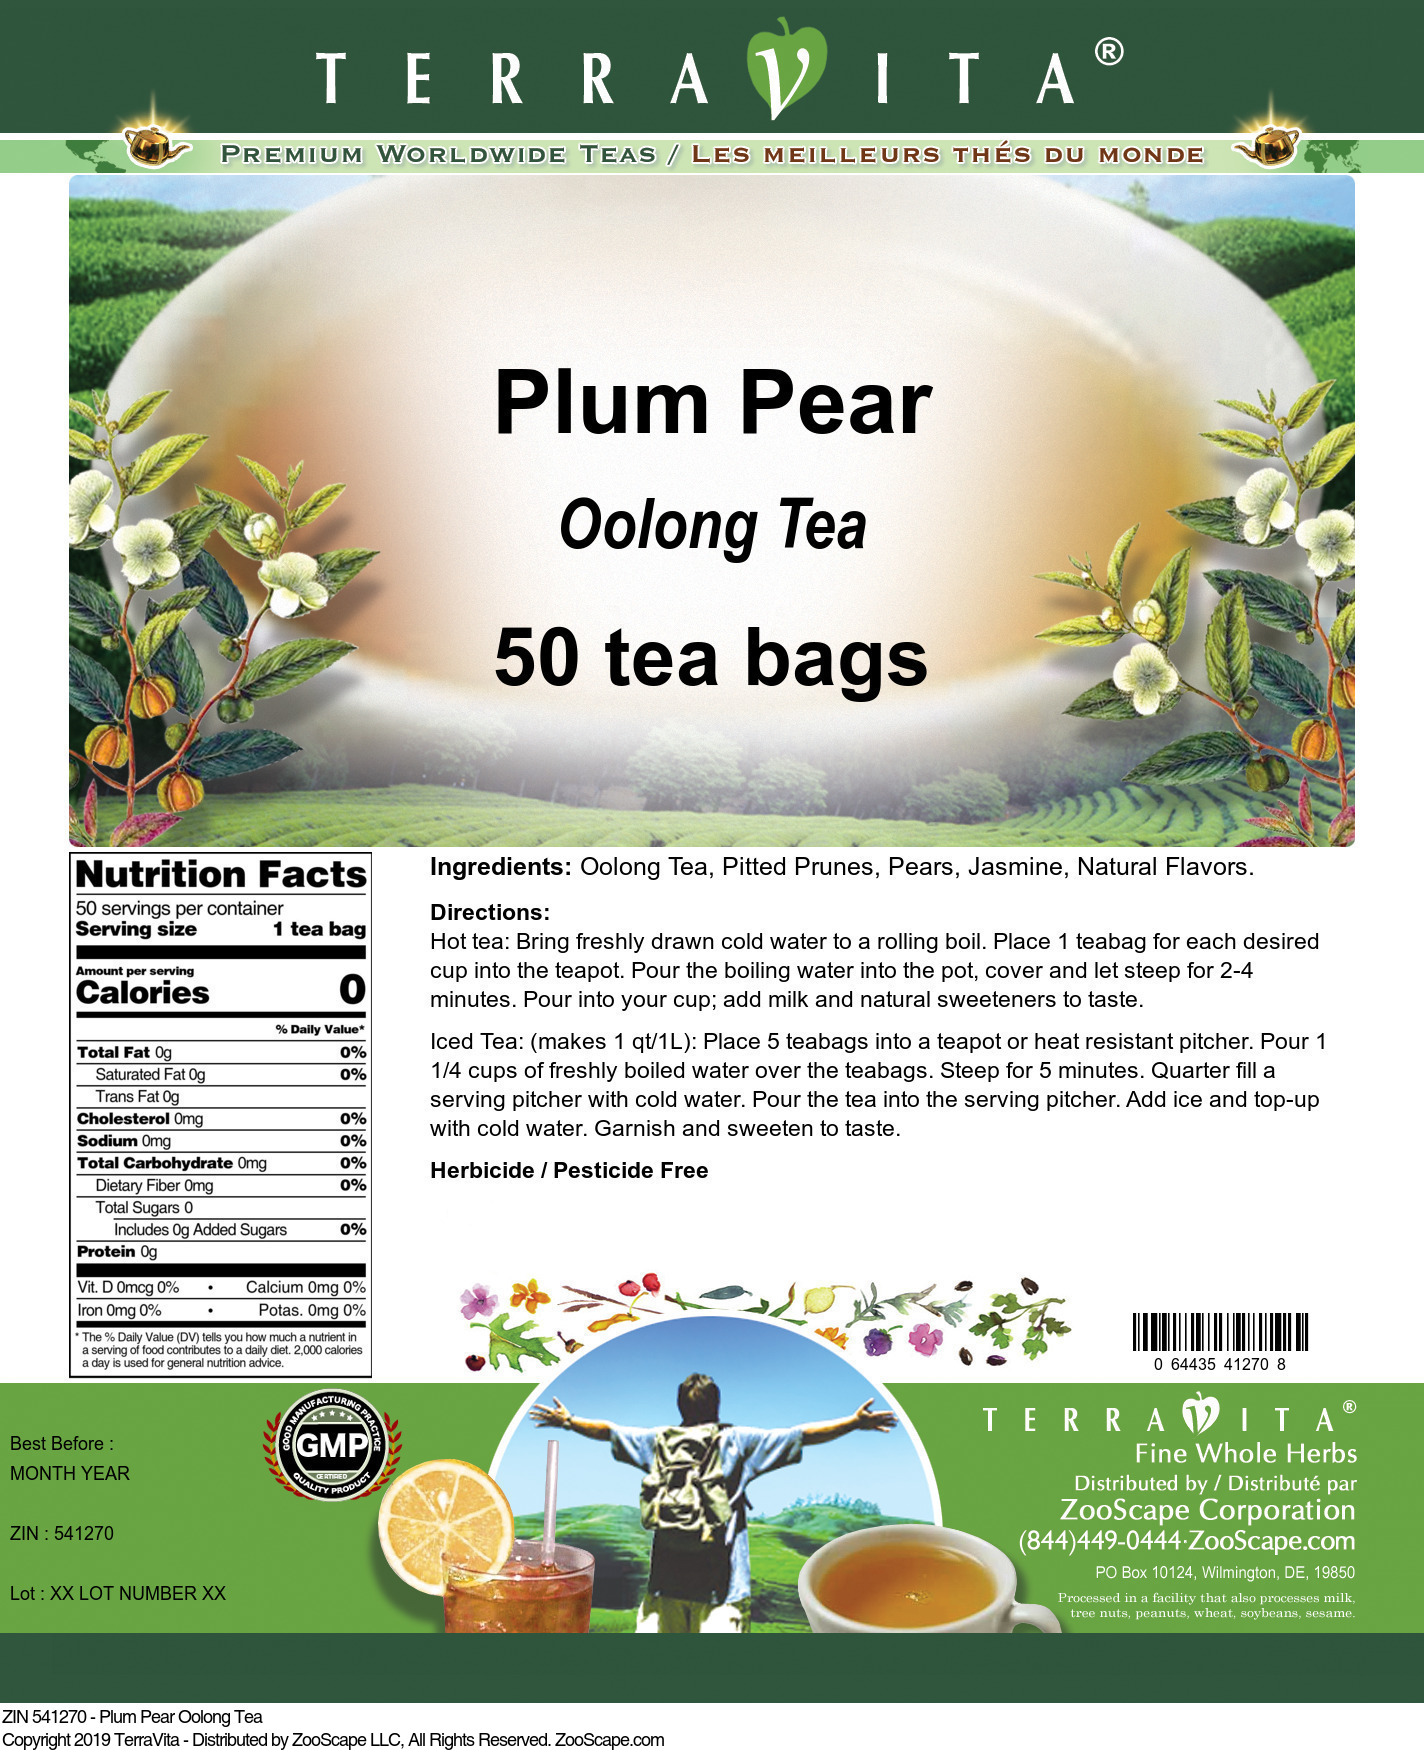 Plum Pear Oolong Tea